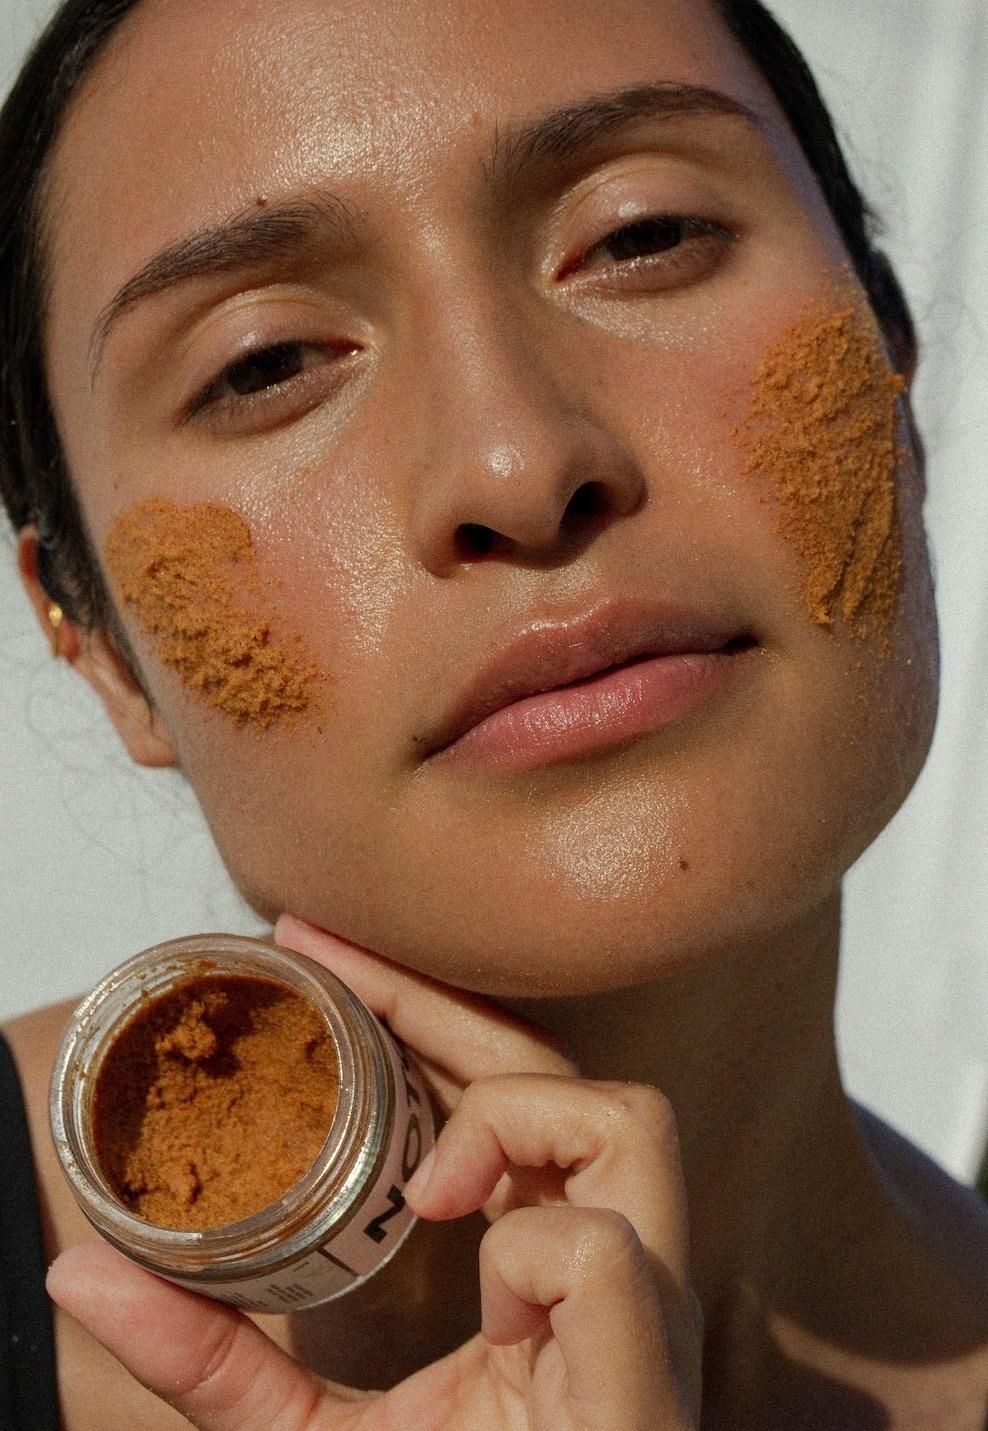 Model applies Noto Botanics' Resurface Scrub on their face